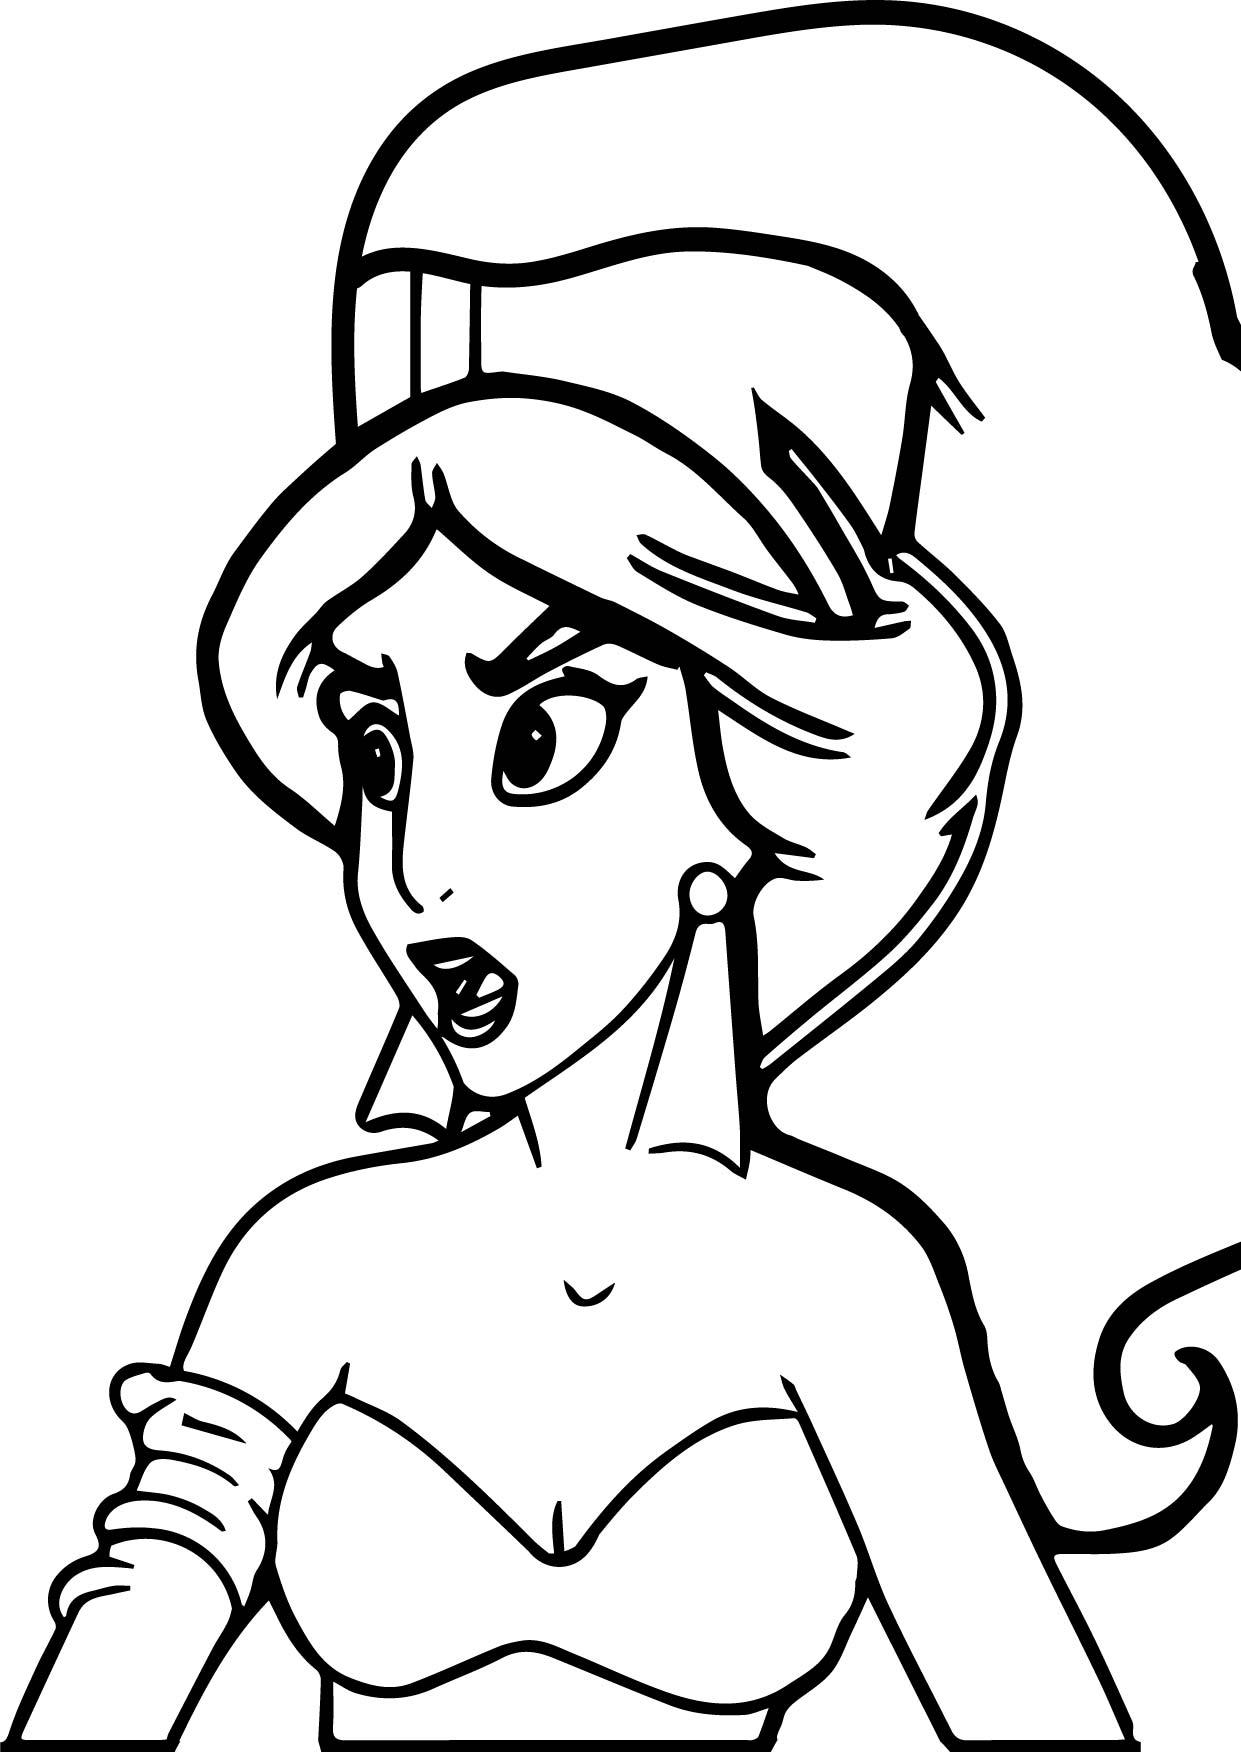 1241x1752 Princess Jasmine From Aladdin Movie Coloring Page Wecoloringpage